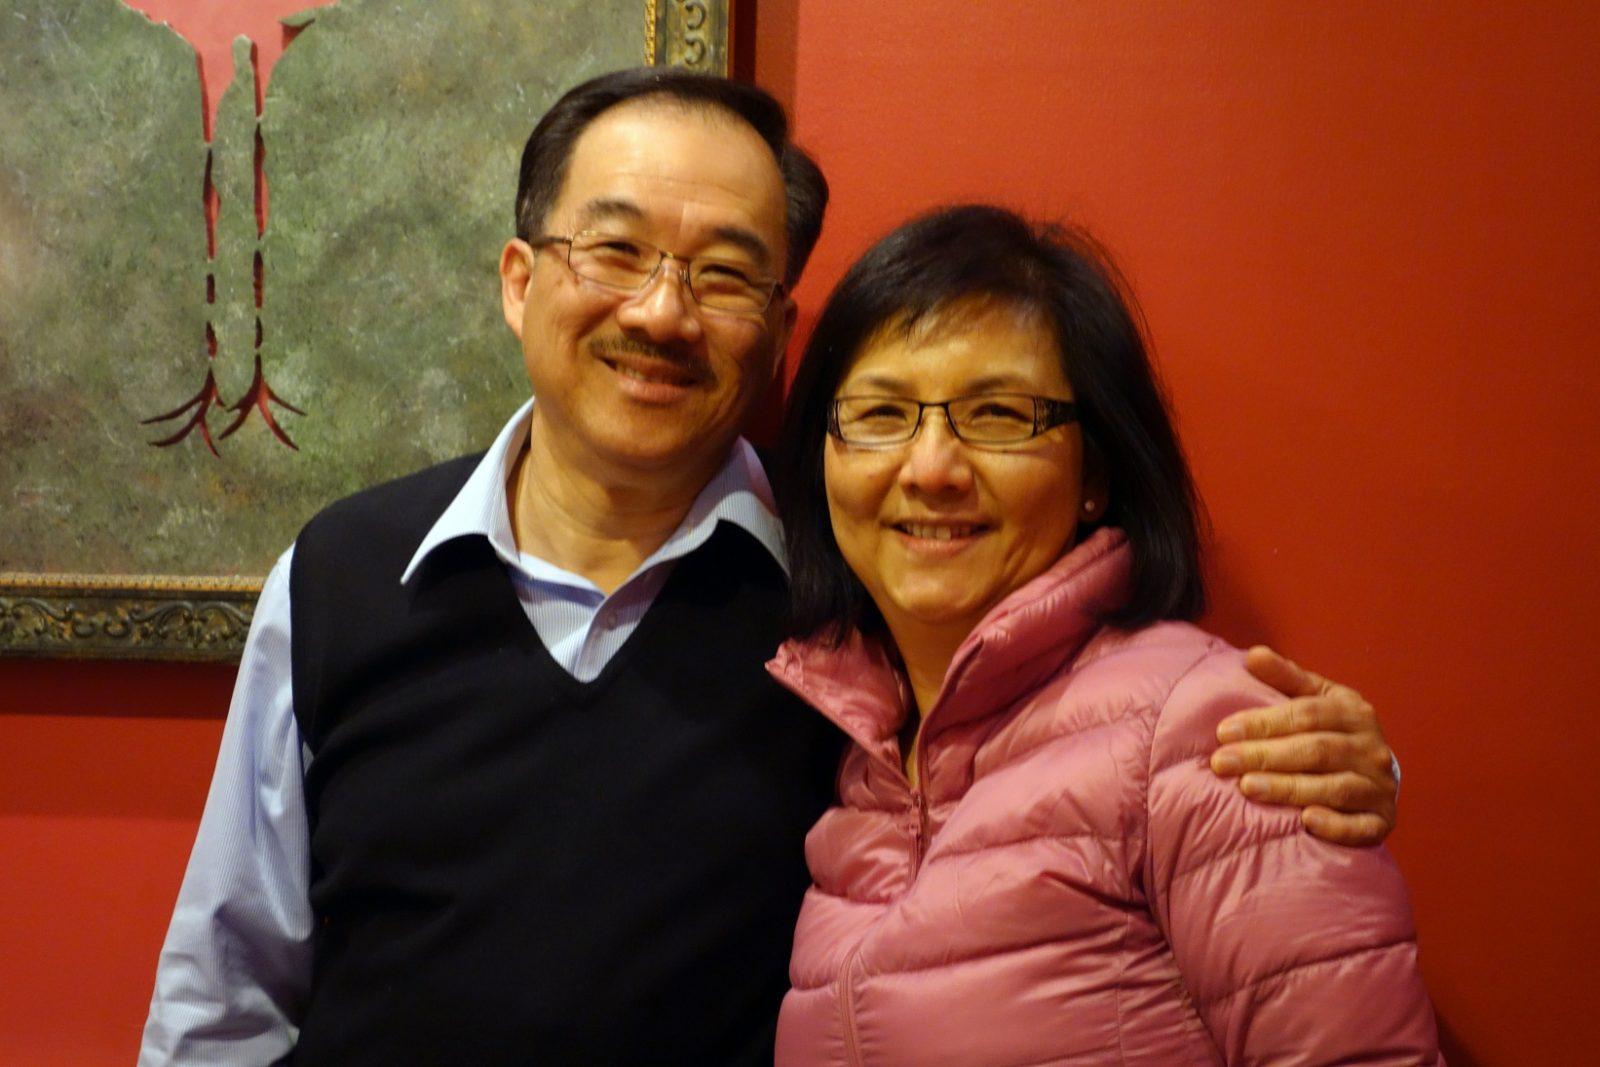 Restaurateurs Joseph and Doris Lee